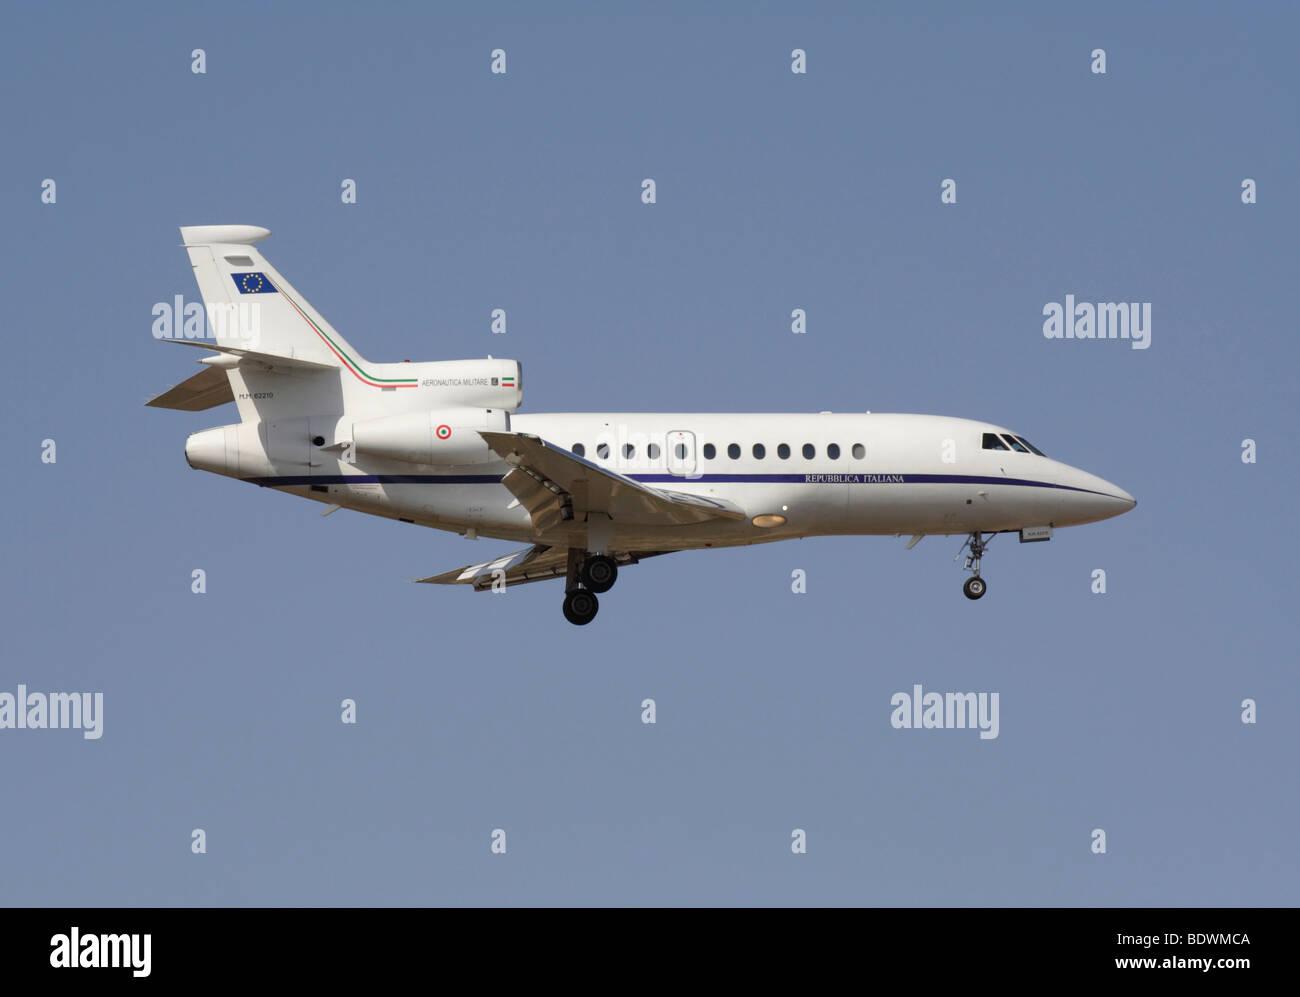 Italian Air Force Dassault Falcon 900EX VIP transport jet plane in flight - Stock Image